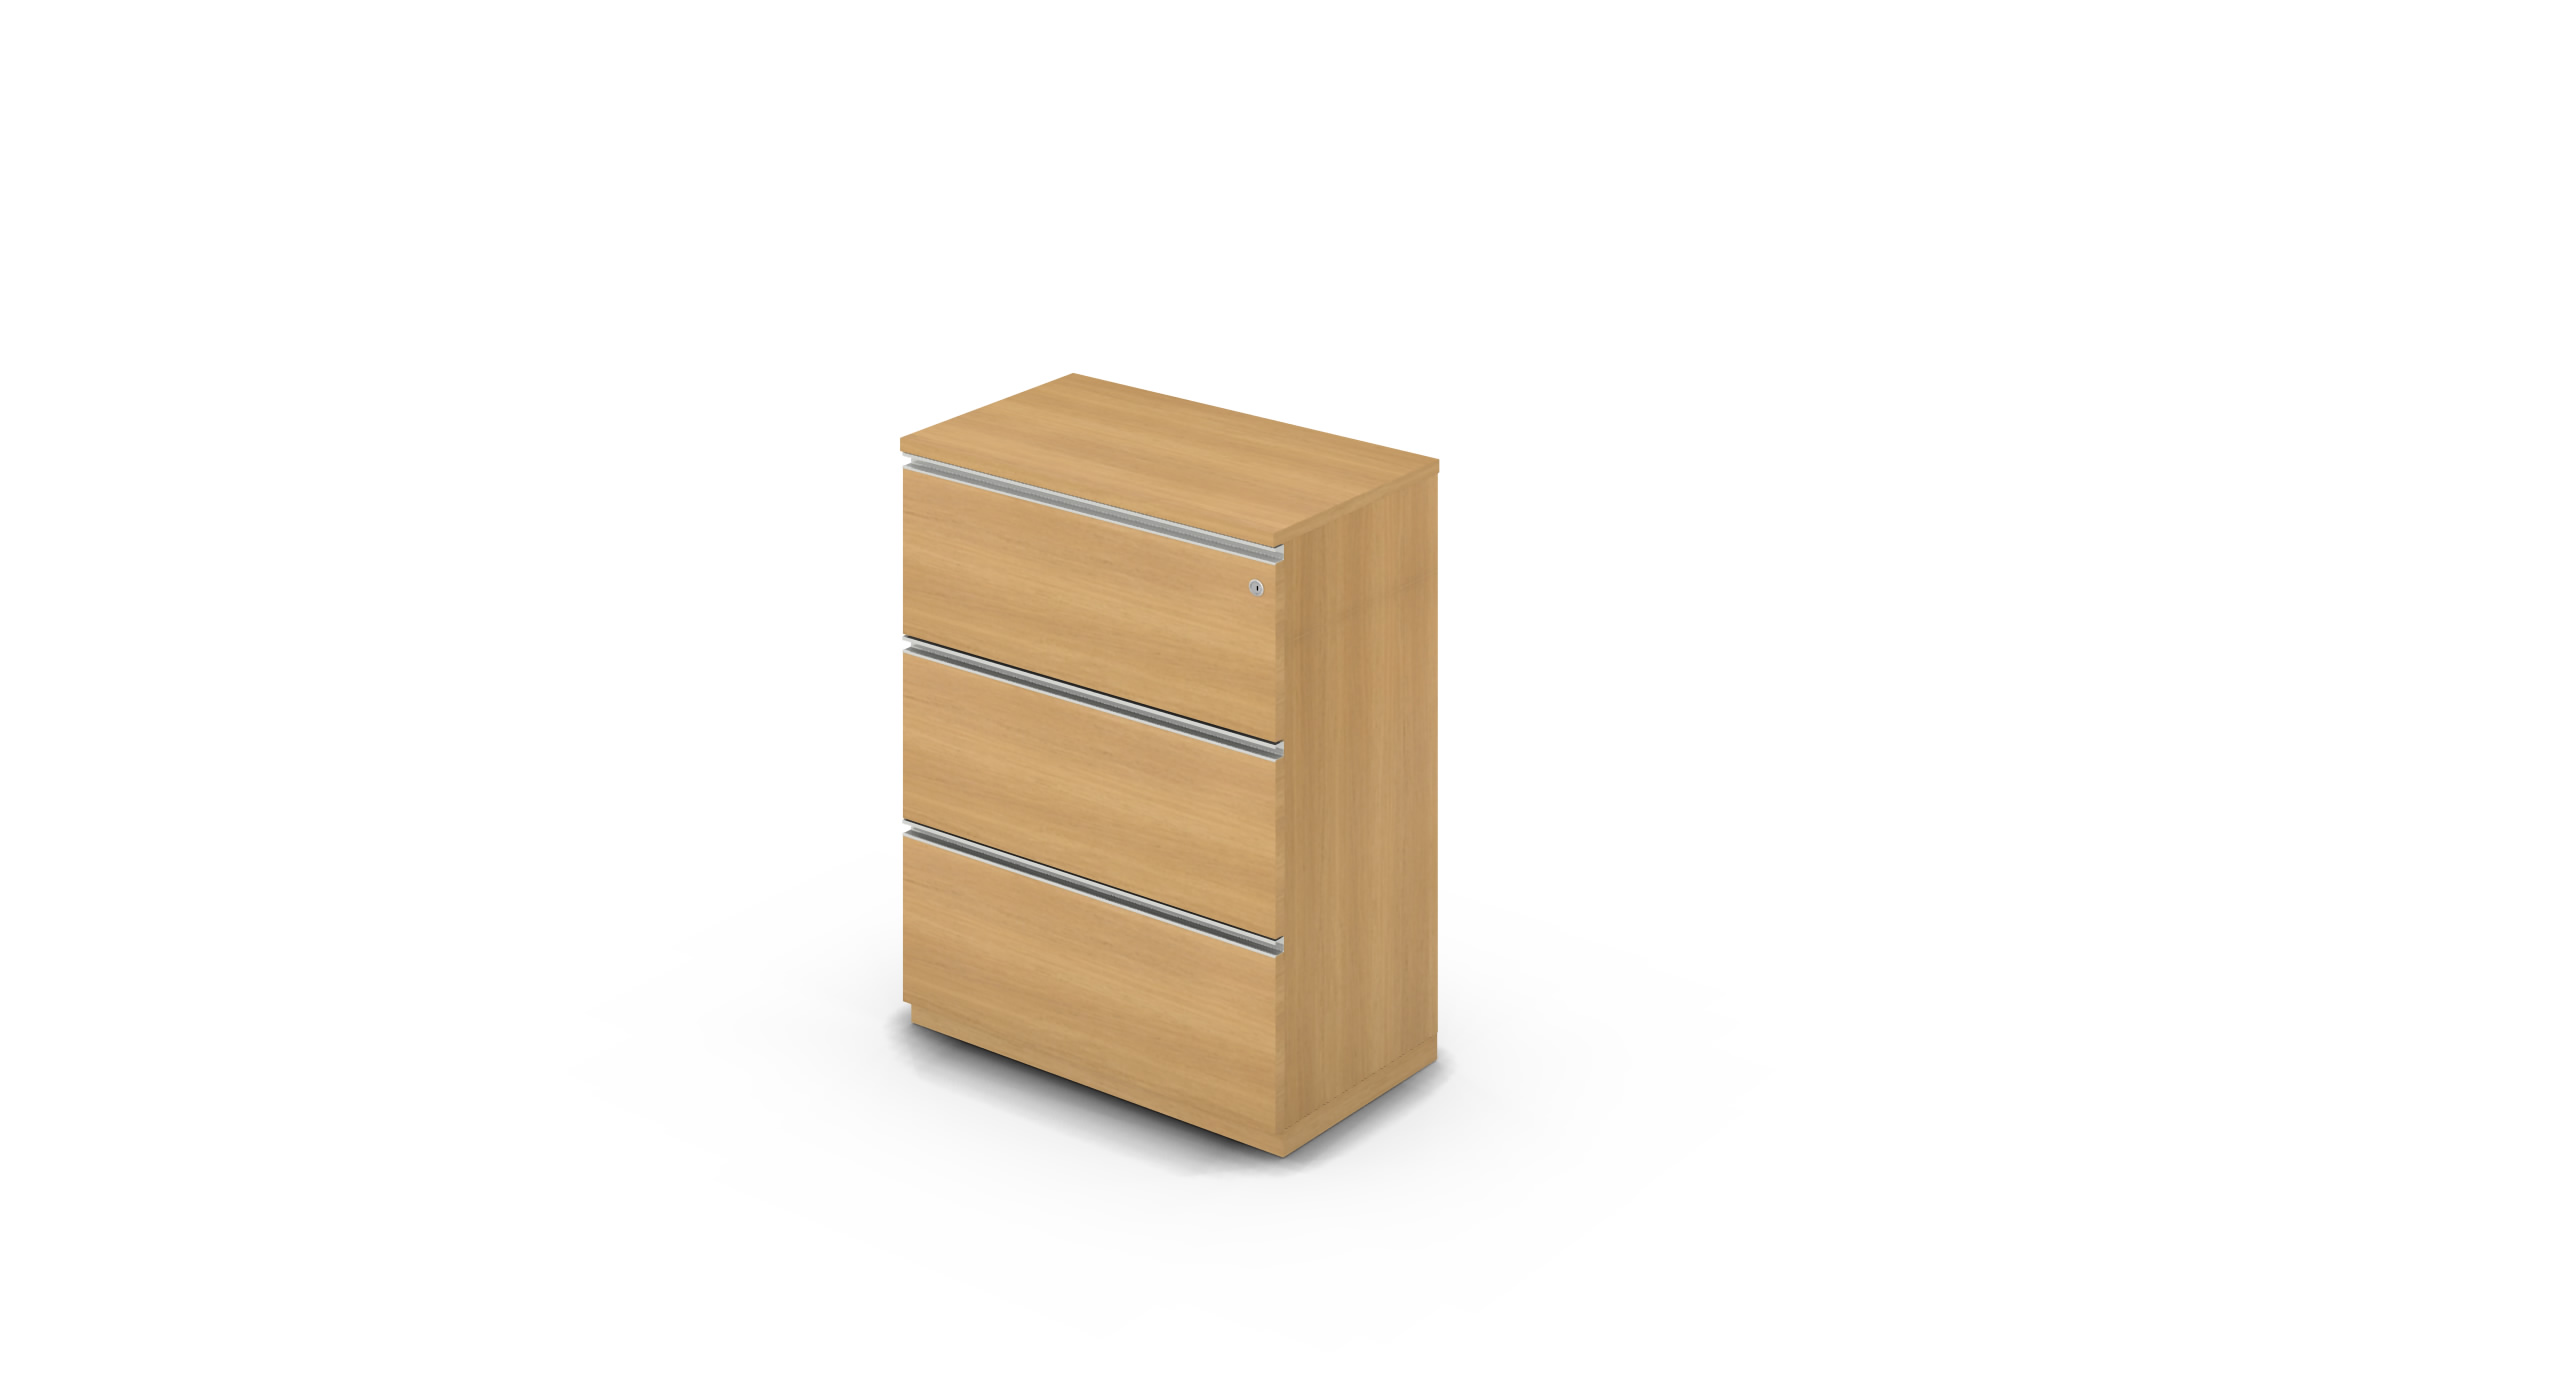 Cabinet_800x450x1125_DR_Oak_Rail_WithCylinder